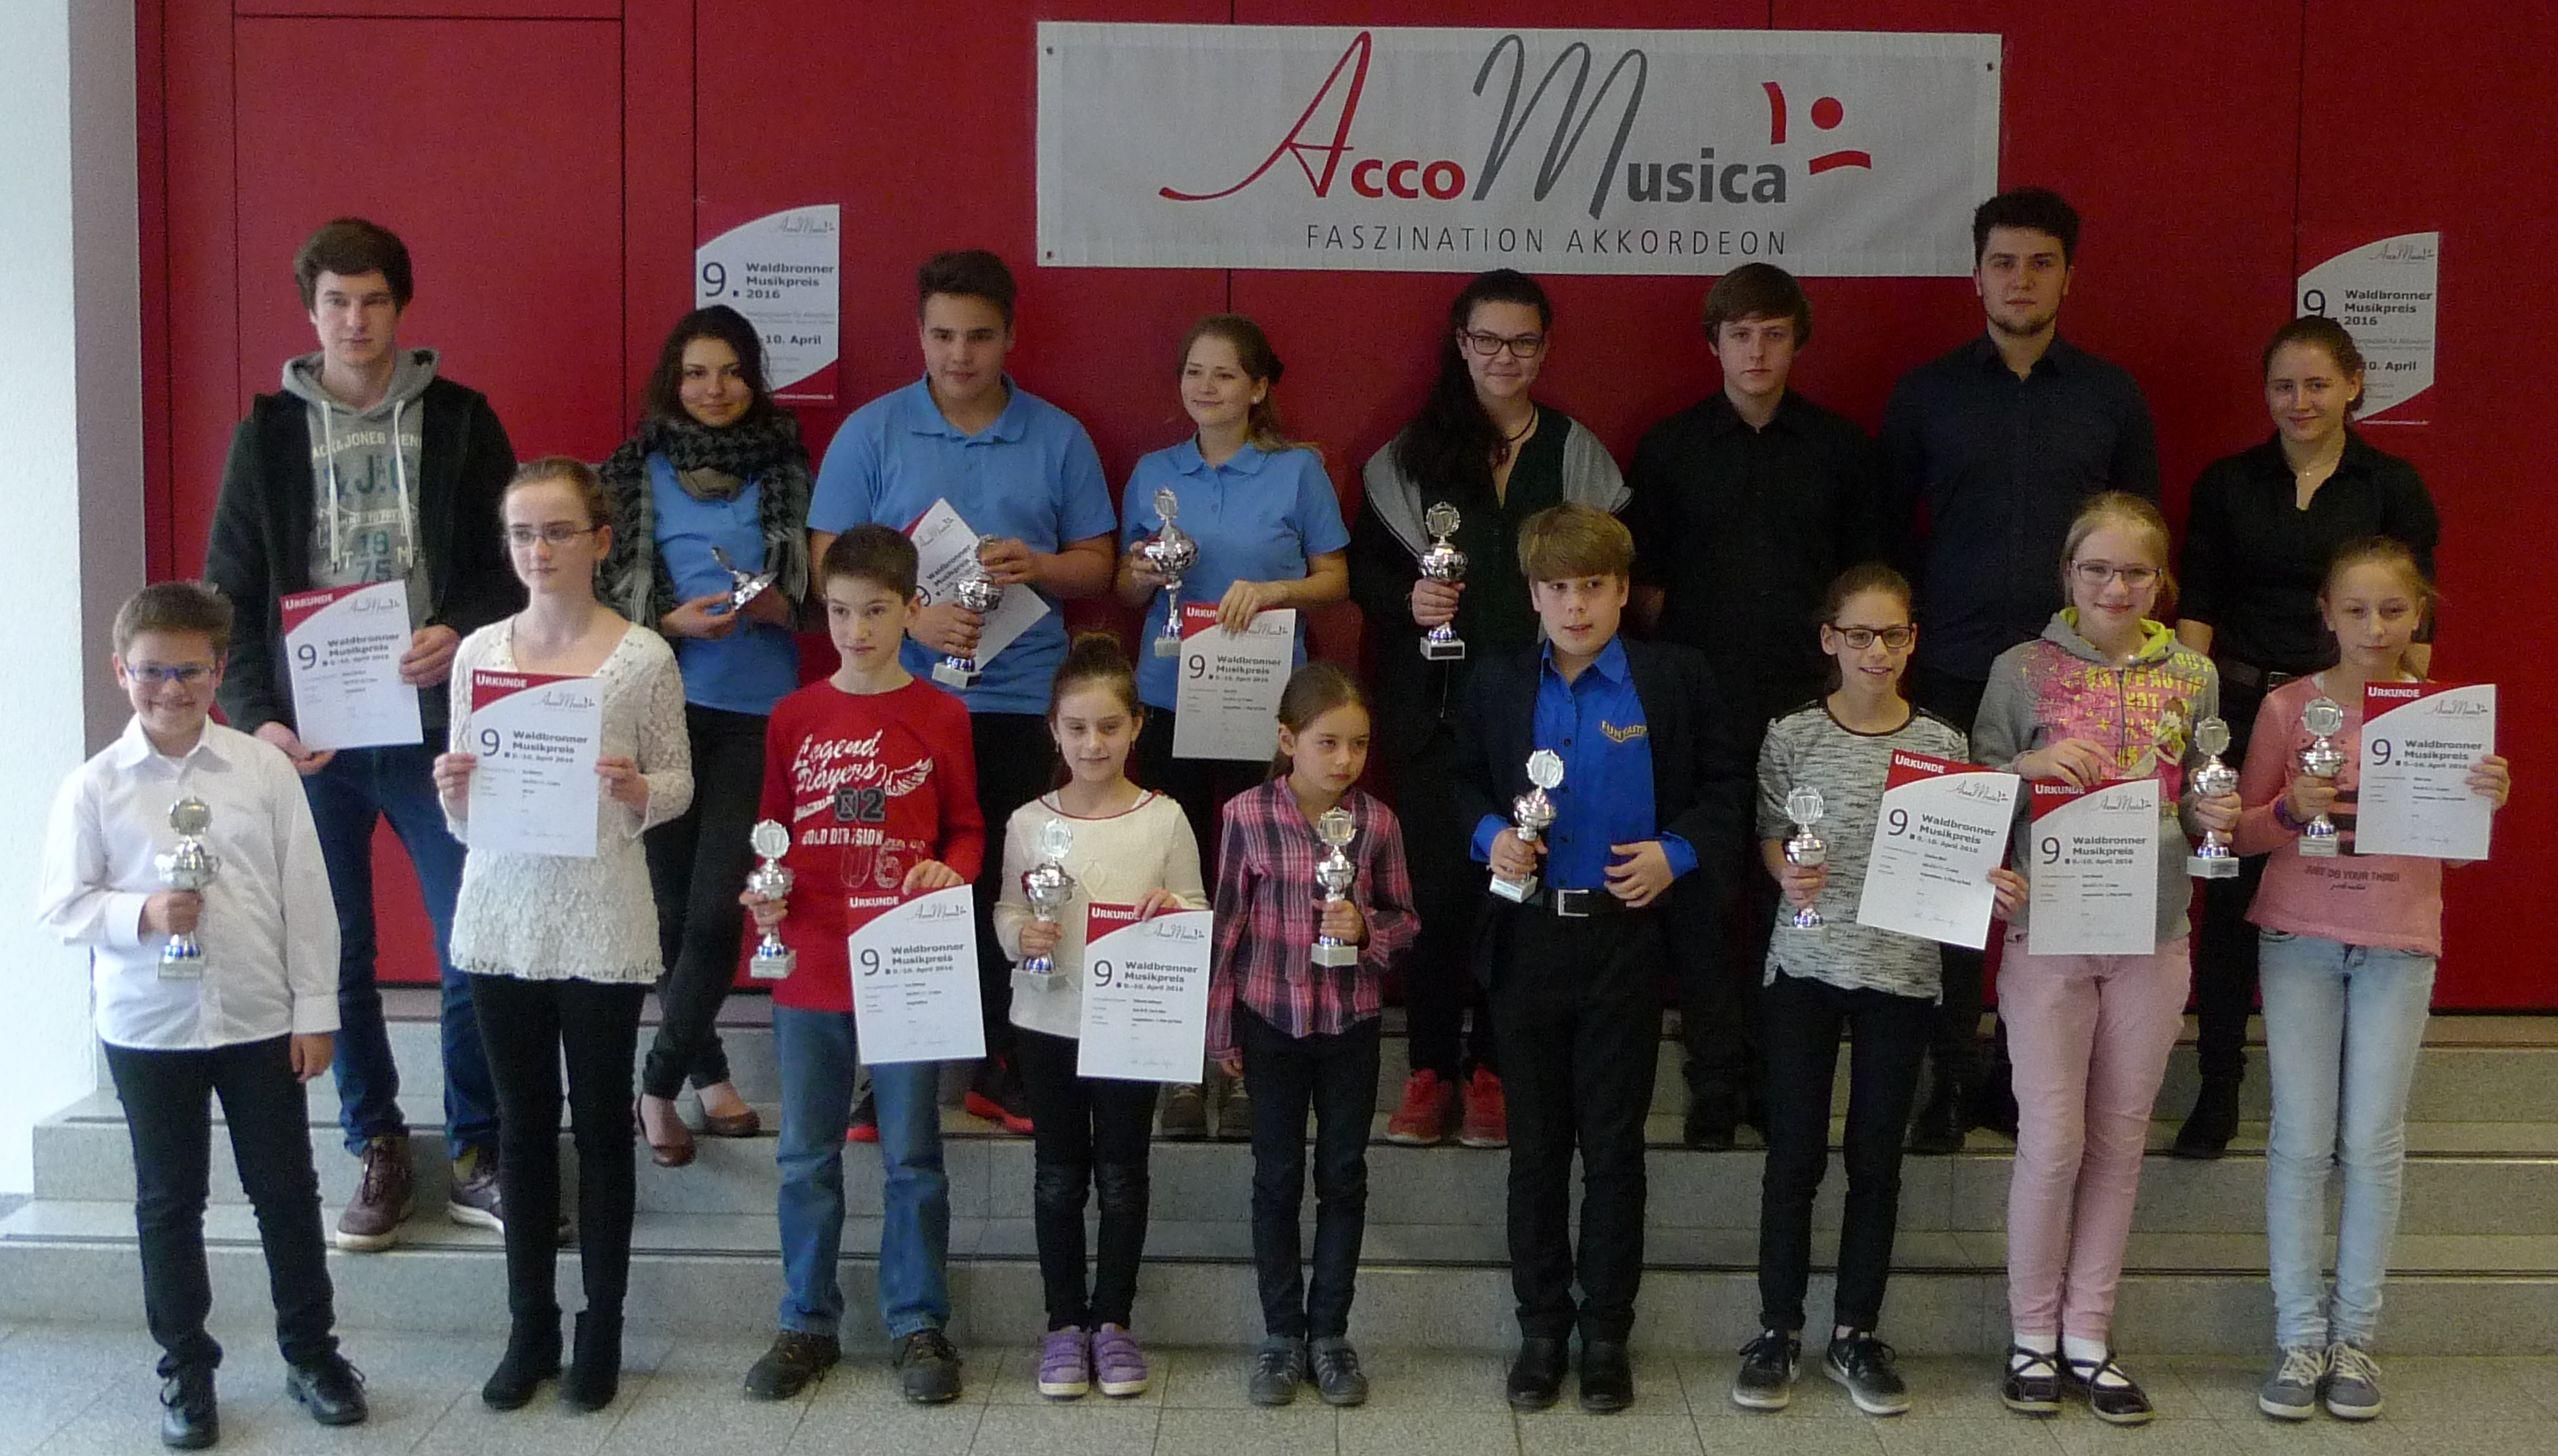 Gruppenbild der Teilnehmer am 9. Waldbronner Musikpreis 2016